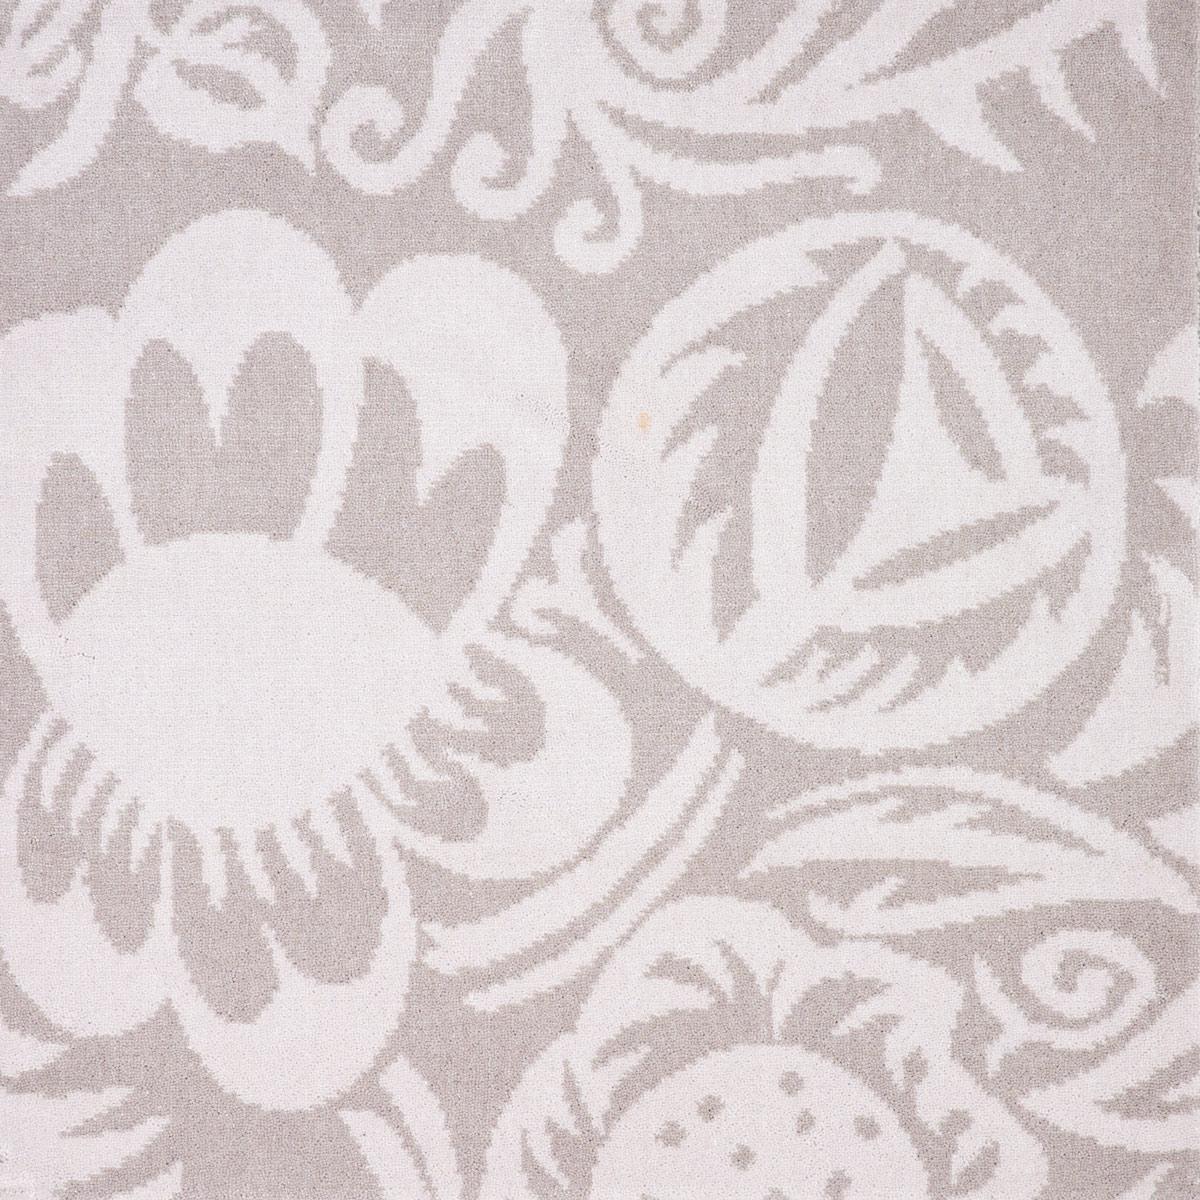 poise_wool-botanical-silk_wilton-broadloom_patterson-flynn-martin_pfm